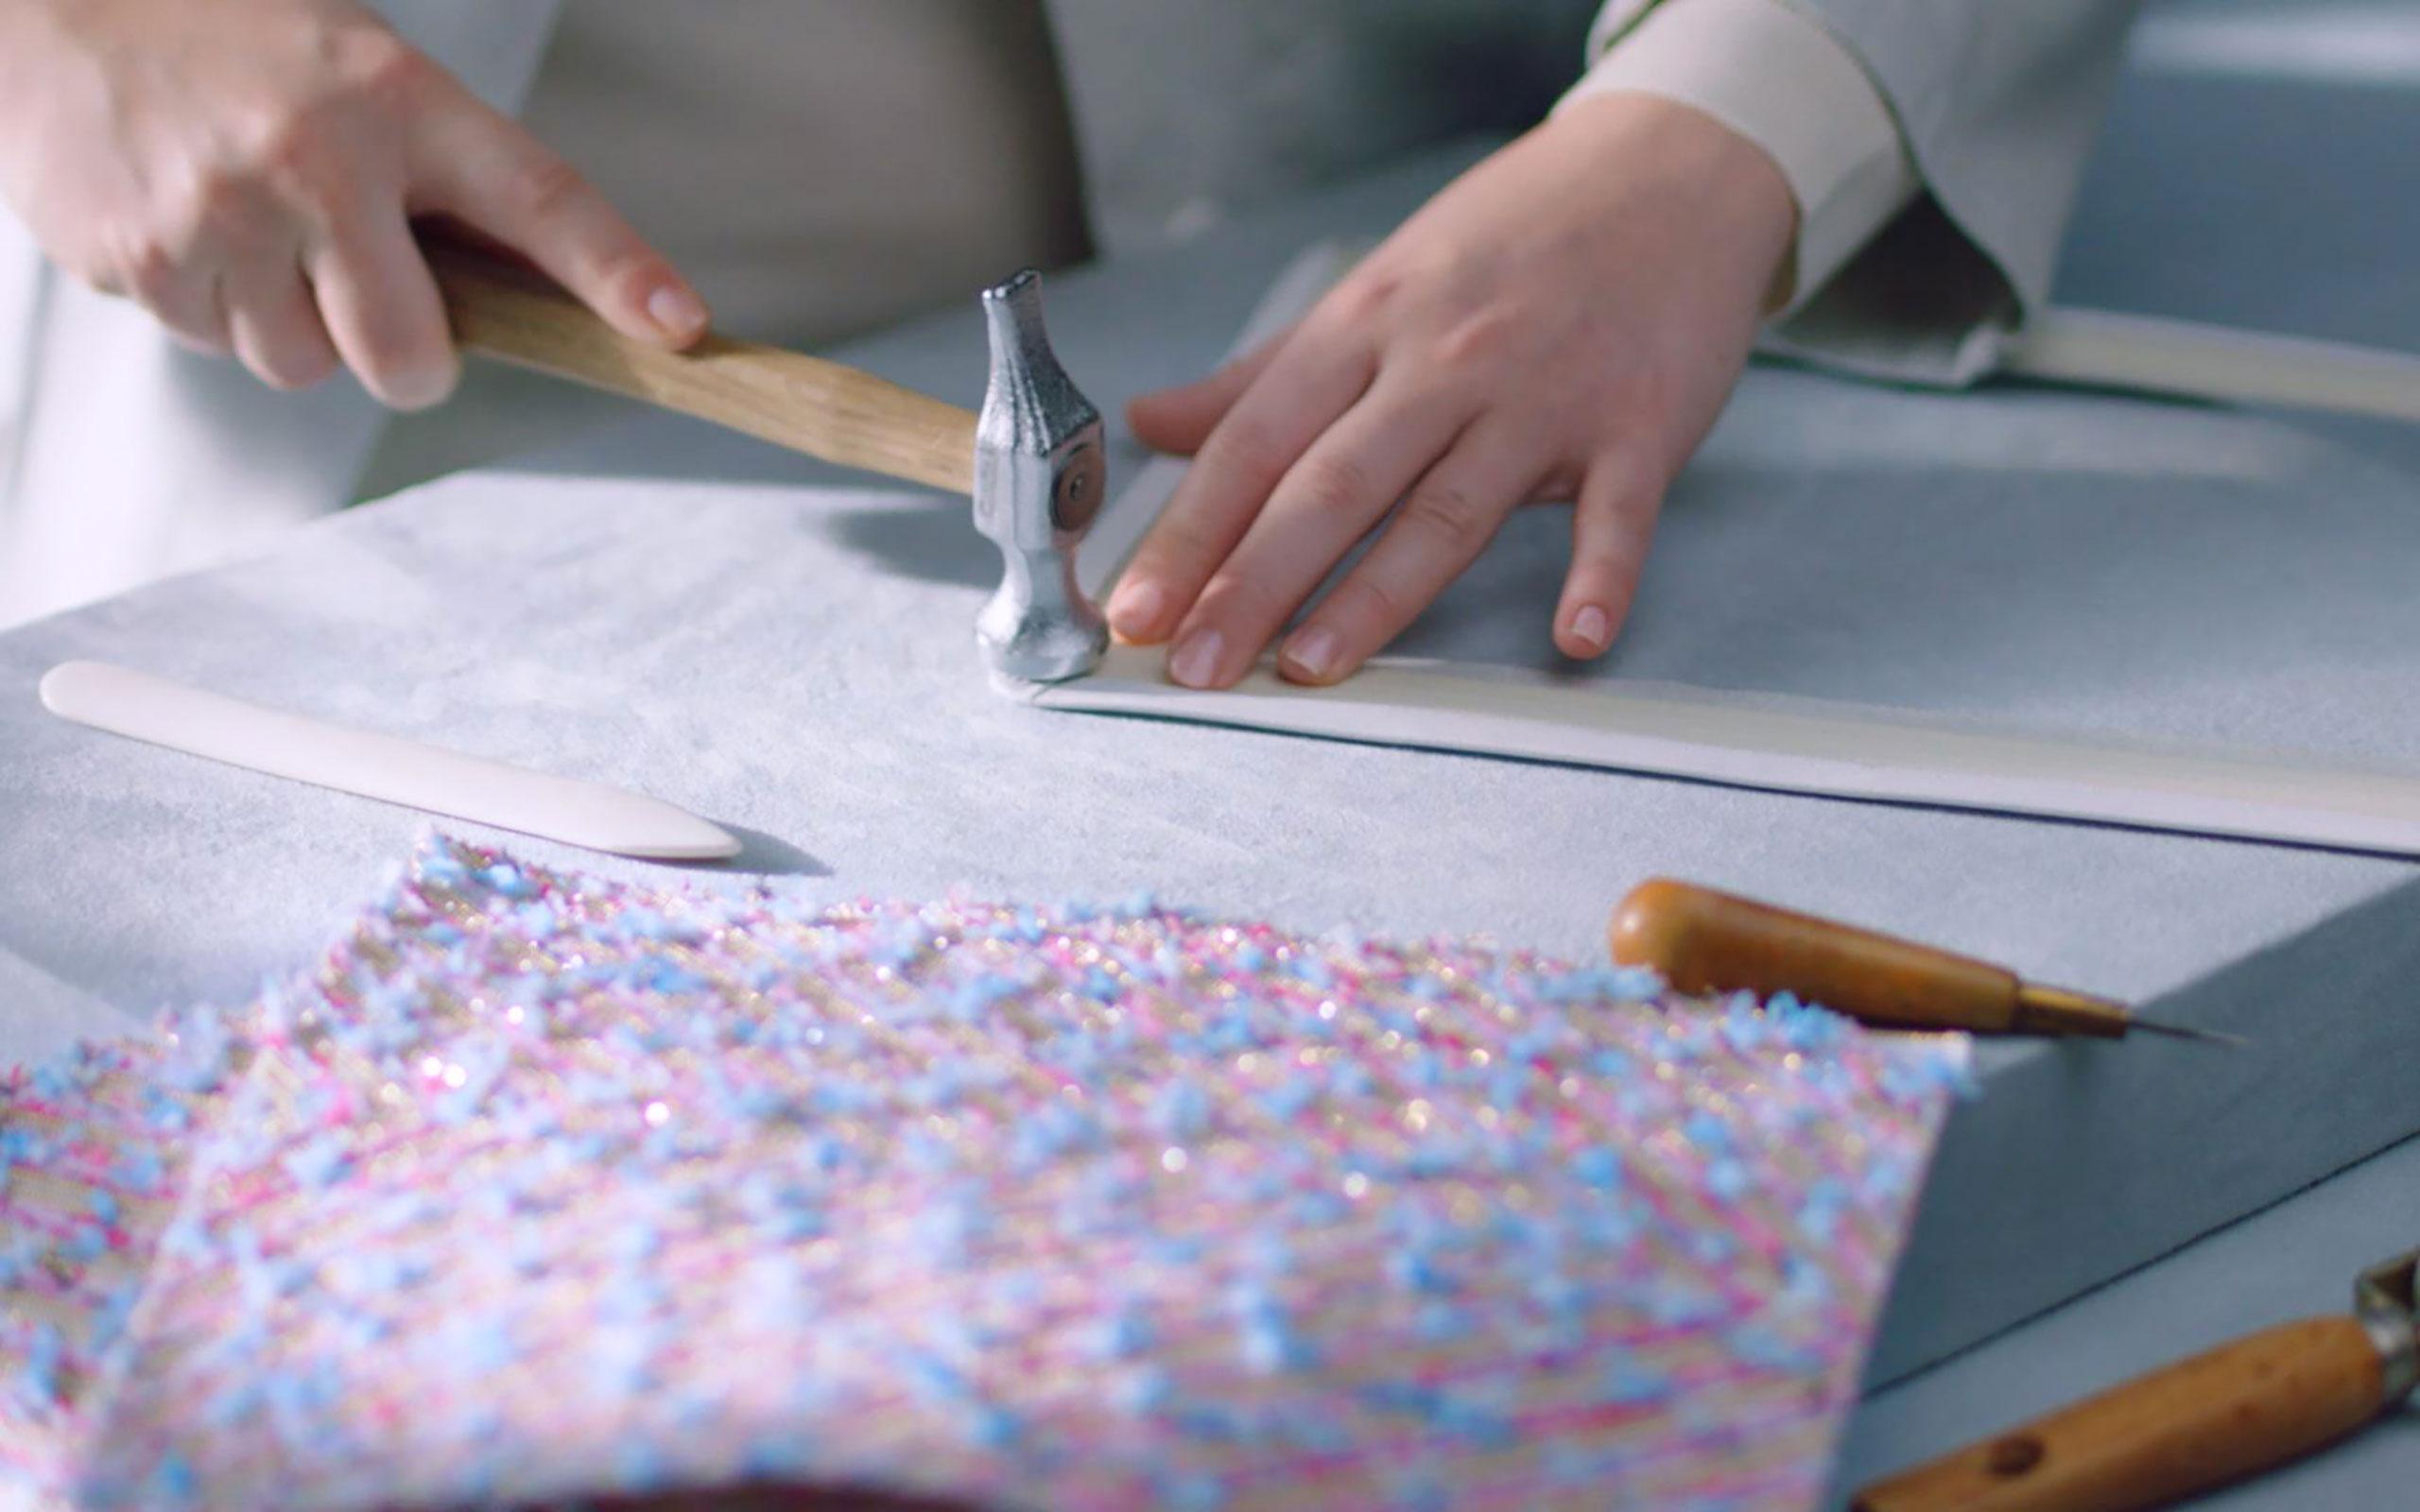 Watch Chanel's New Film Focusing On Its Savoir-Fair